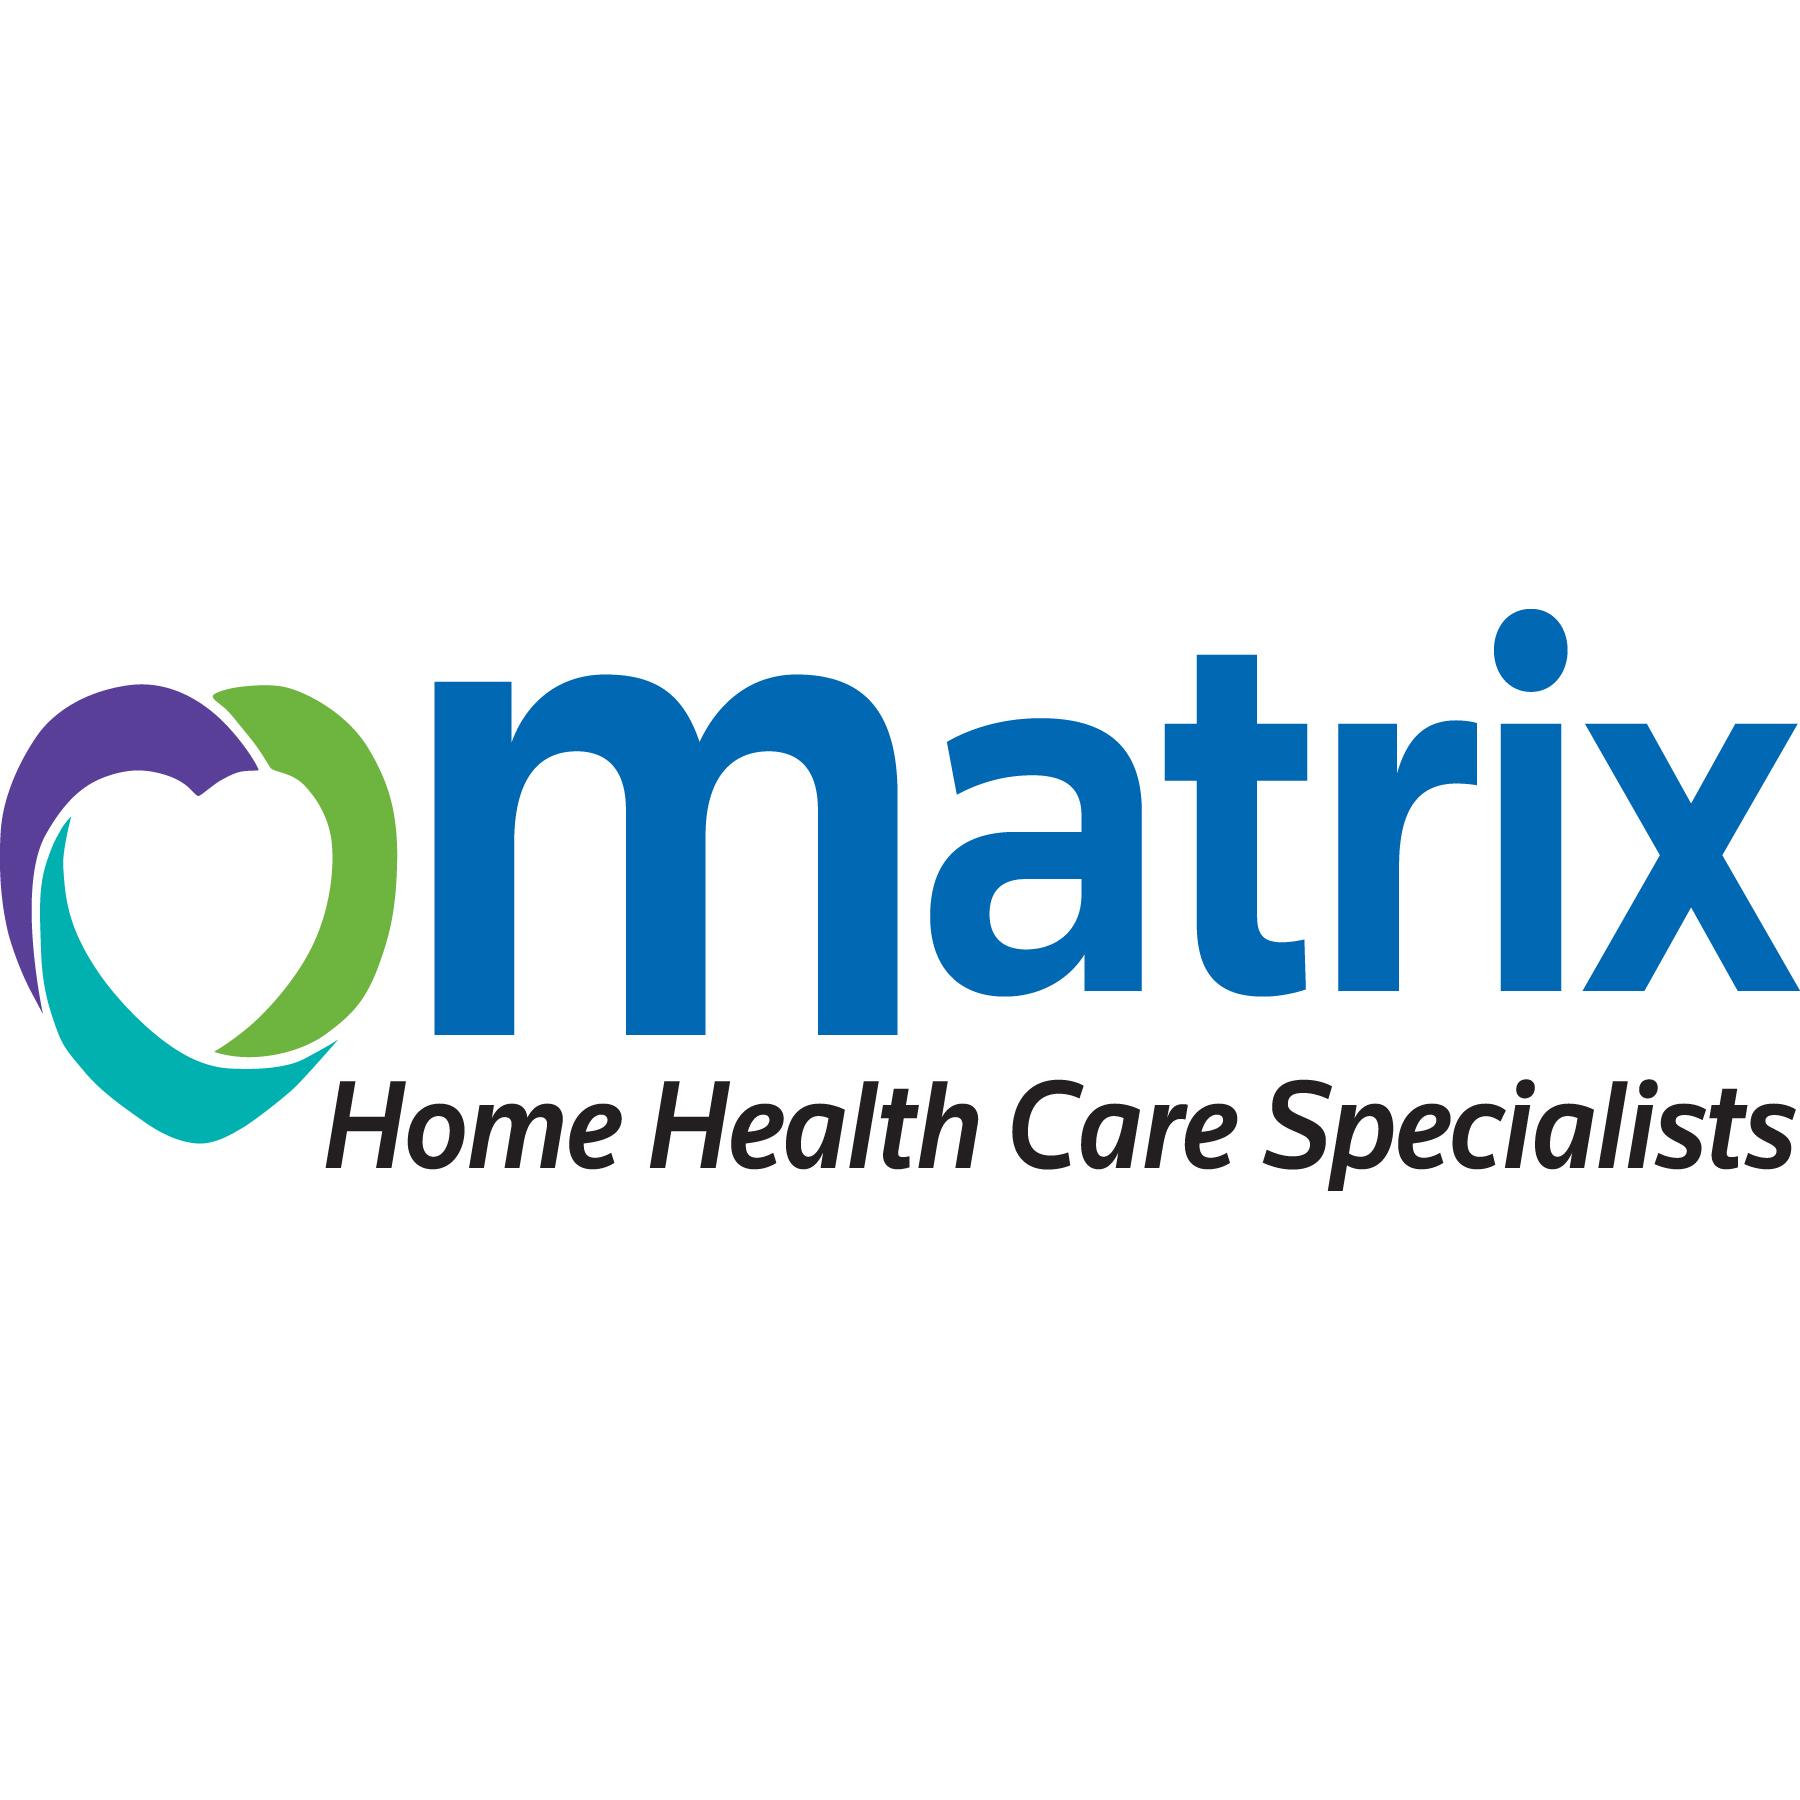 Matrix13 Home: Matrix Home Health Care Specialists